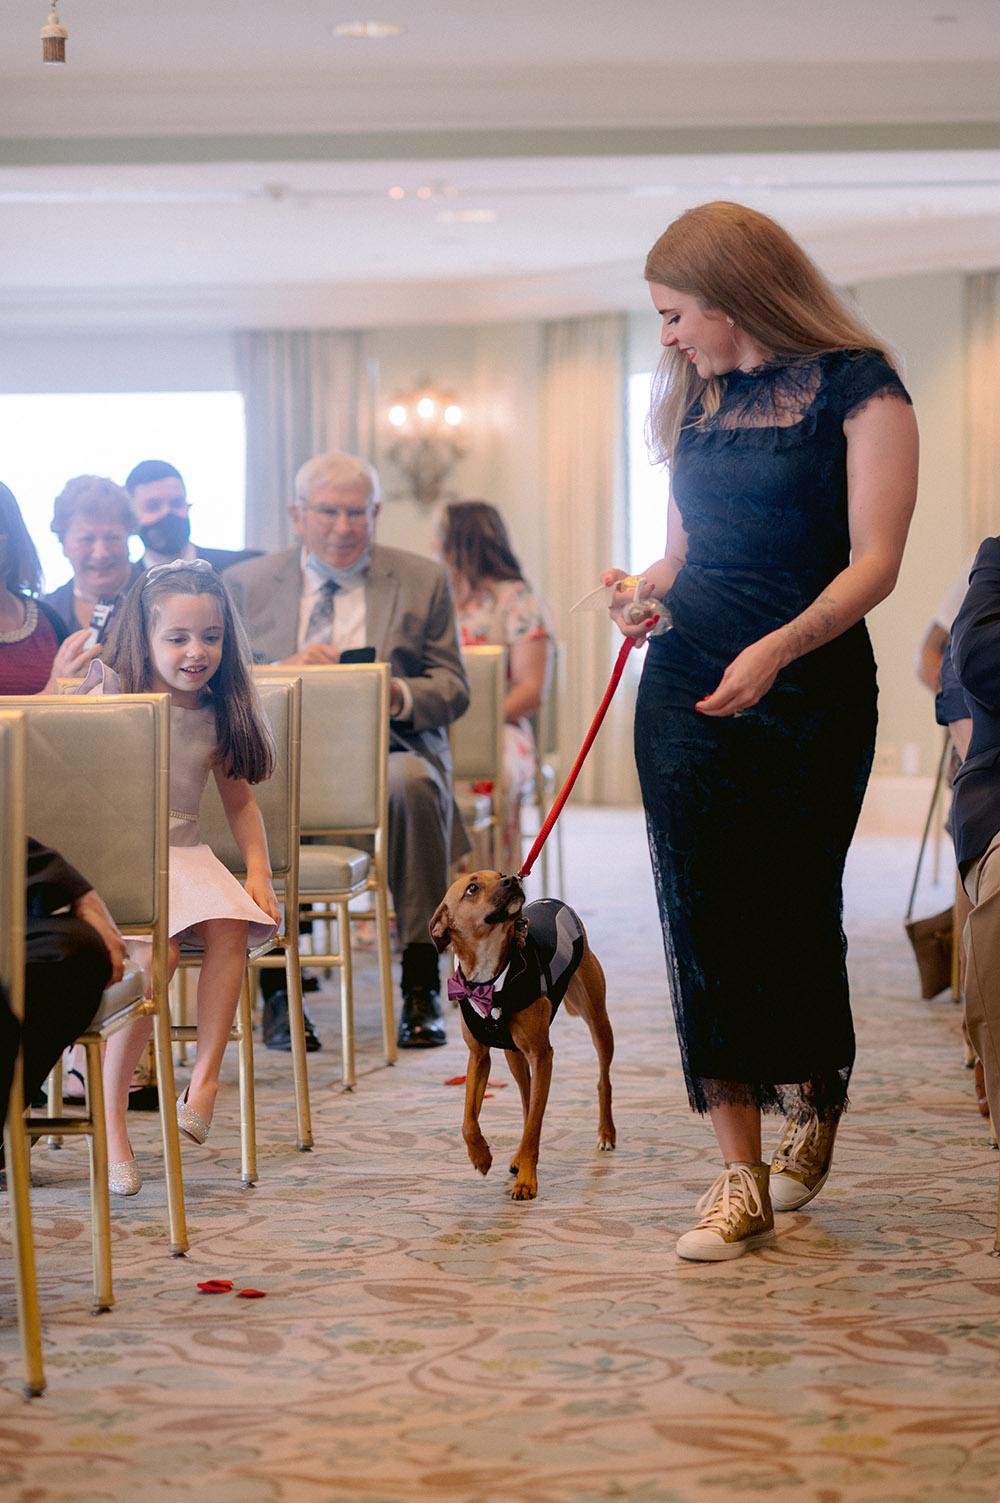 the groom's dog walks down the aisle